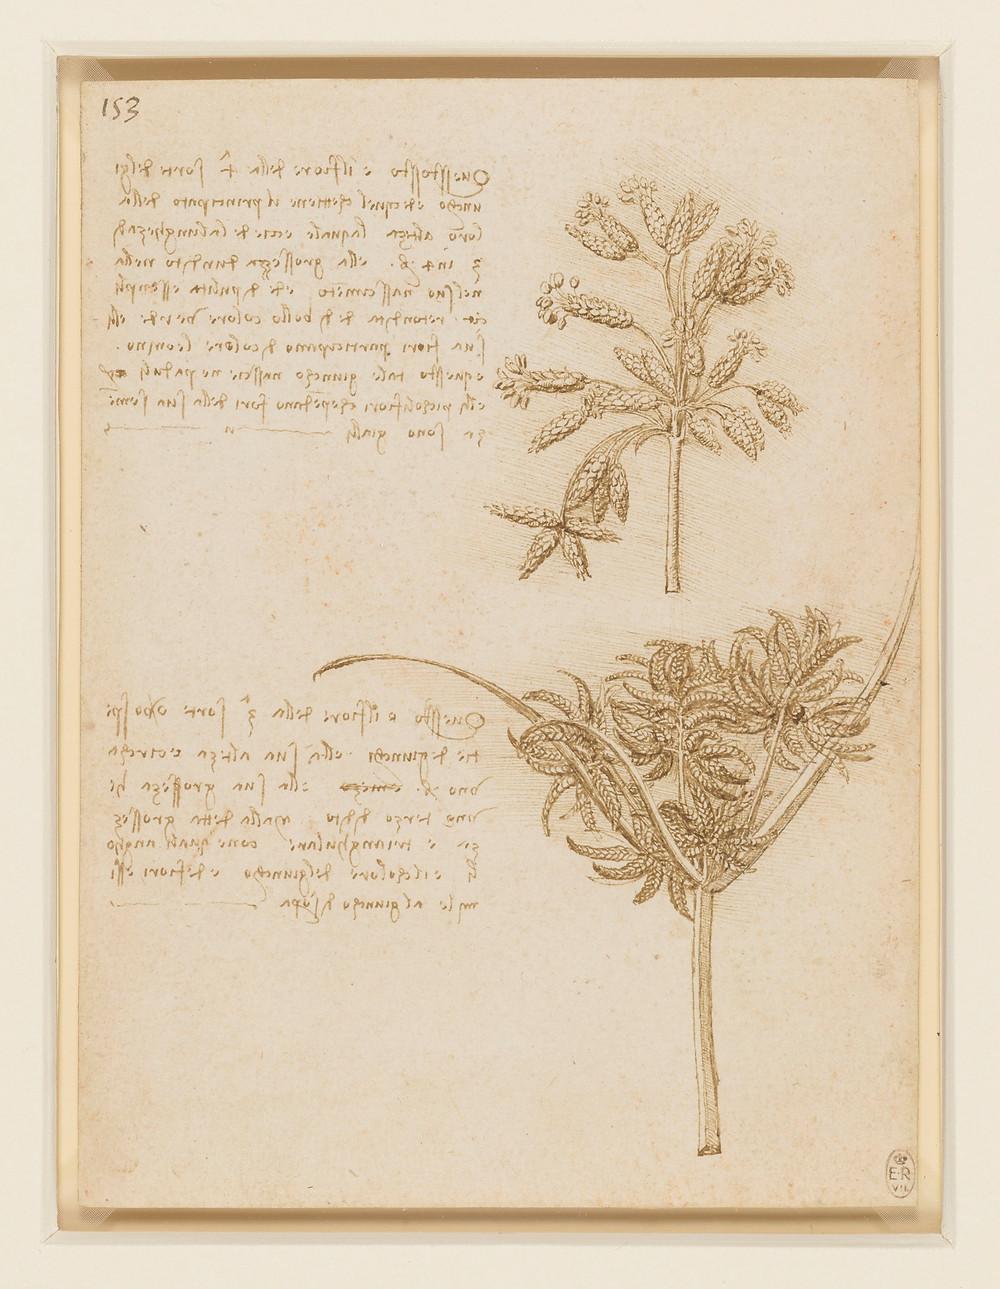 Leonardo Da Vinci's botanical drawing and text of a rush